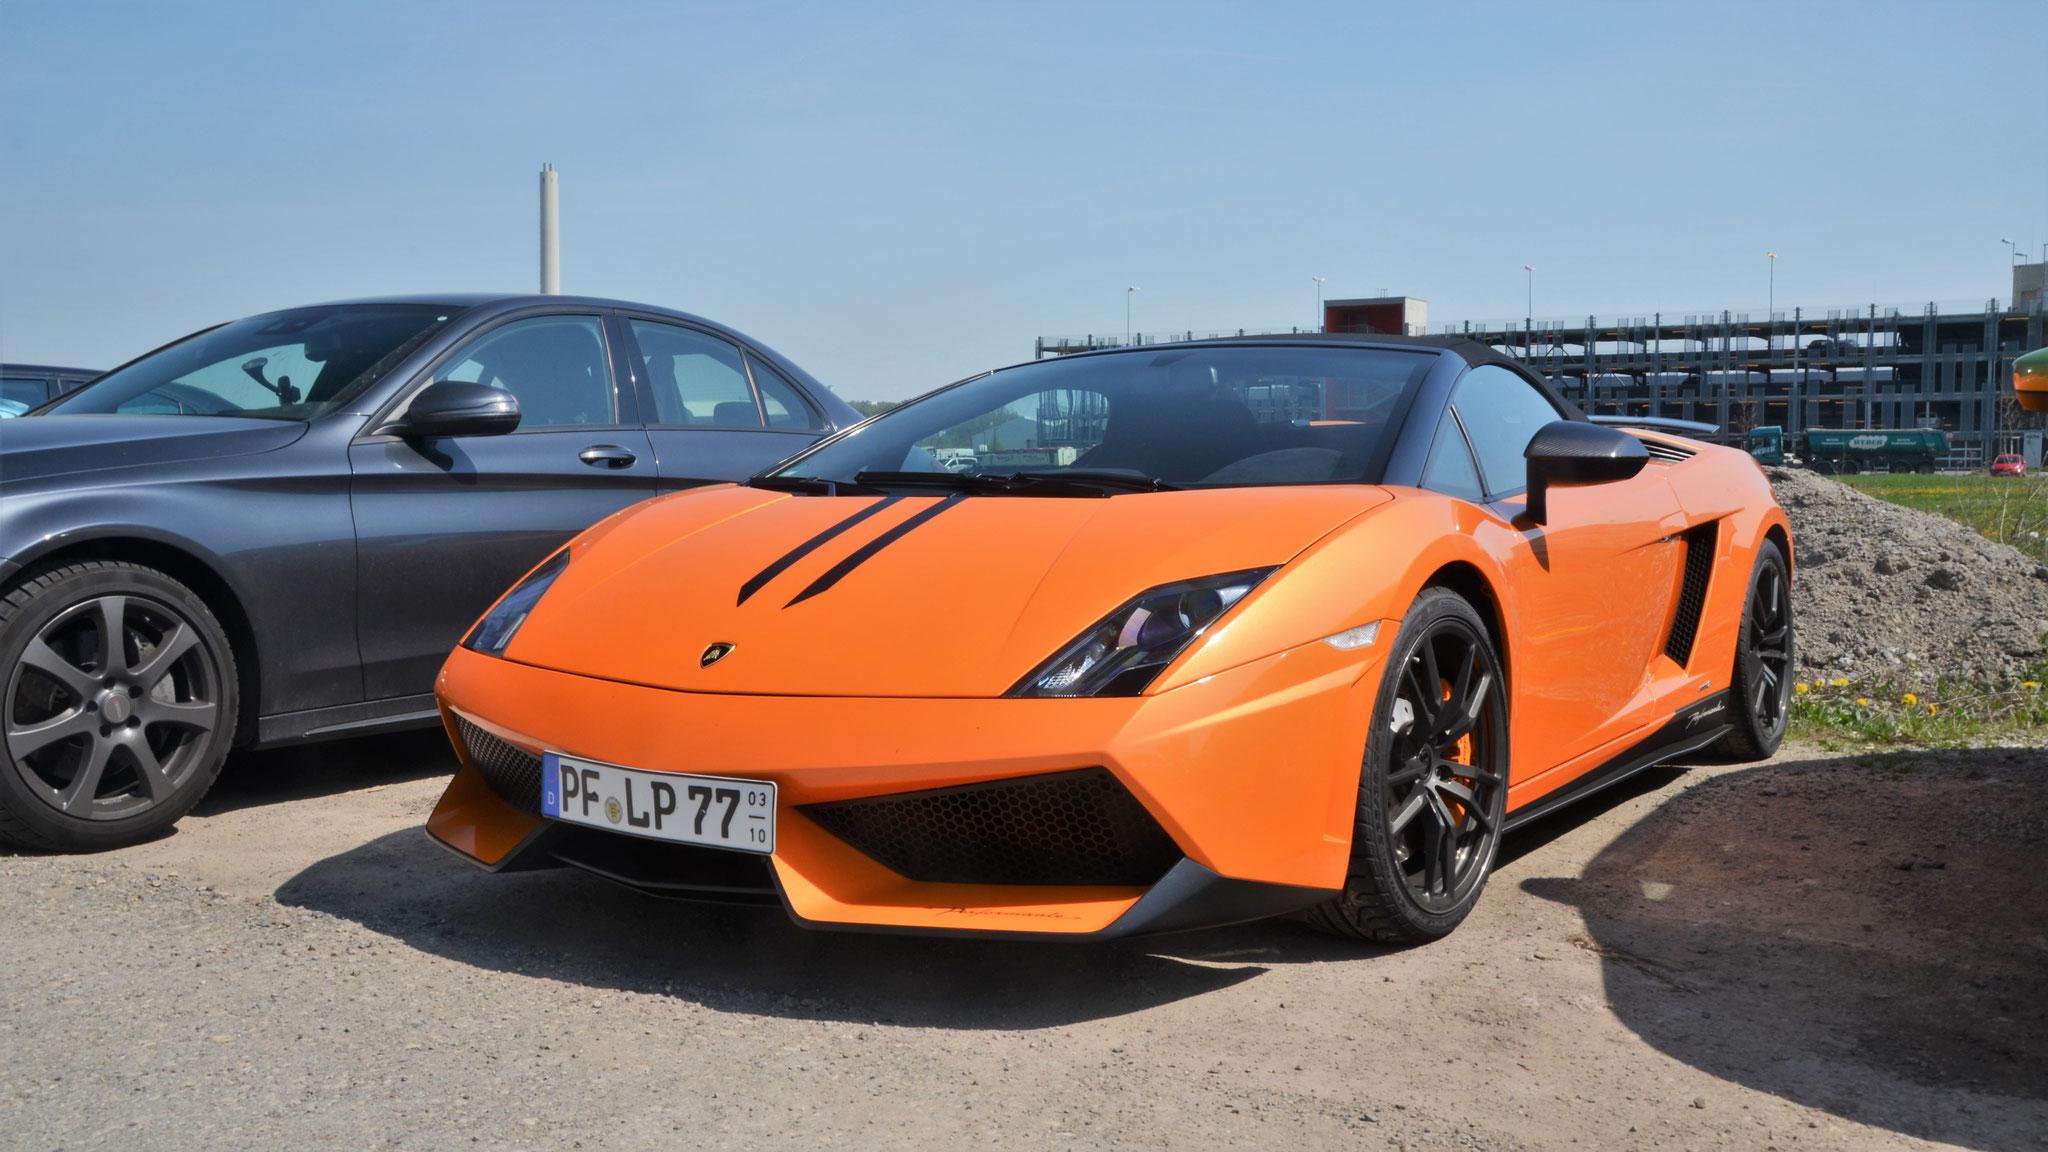 Lamborghini Gallardo Performante - PF-LP-77